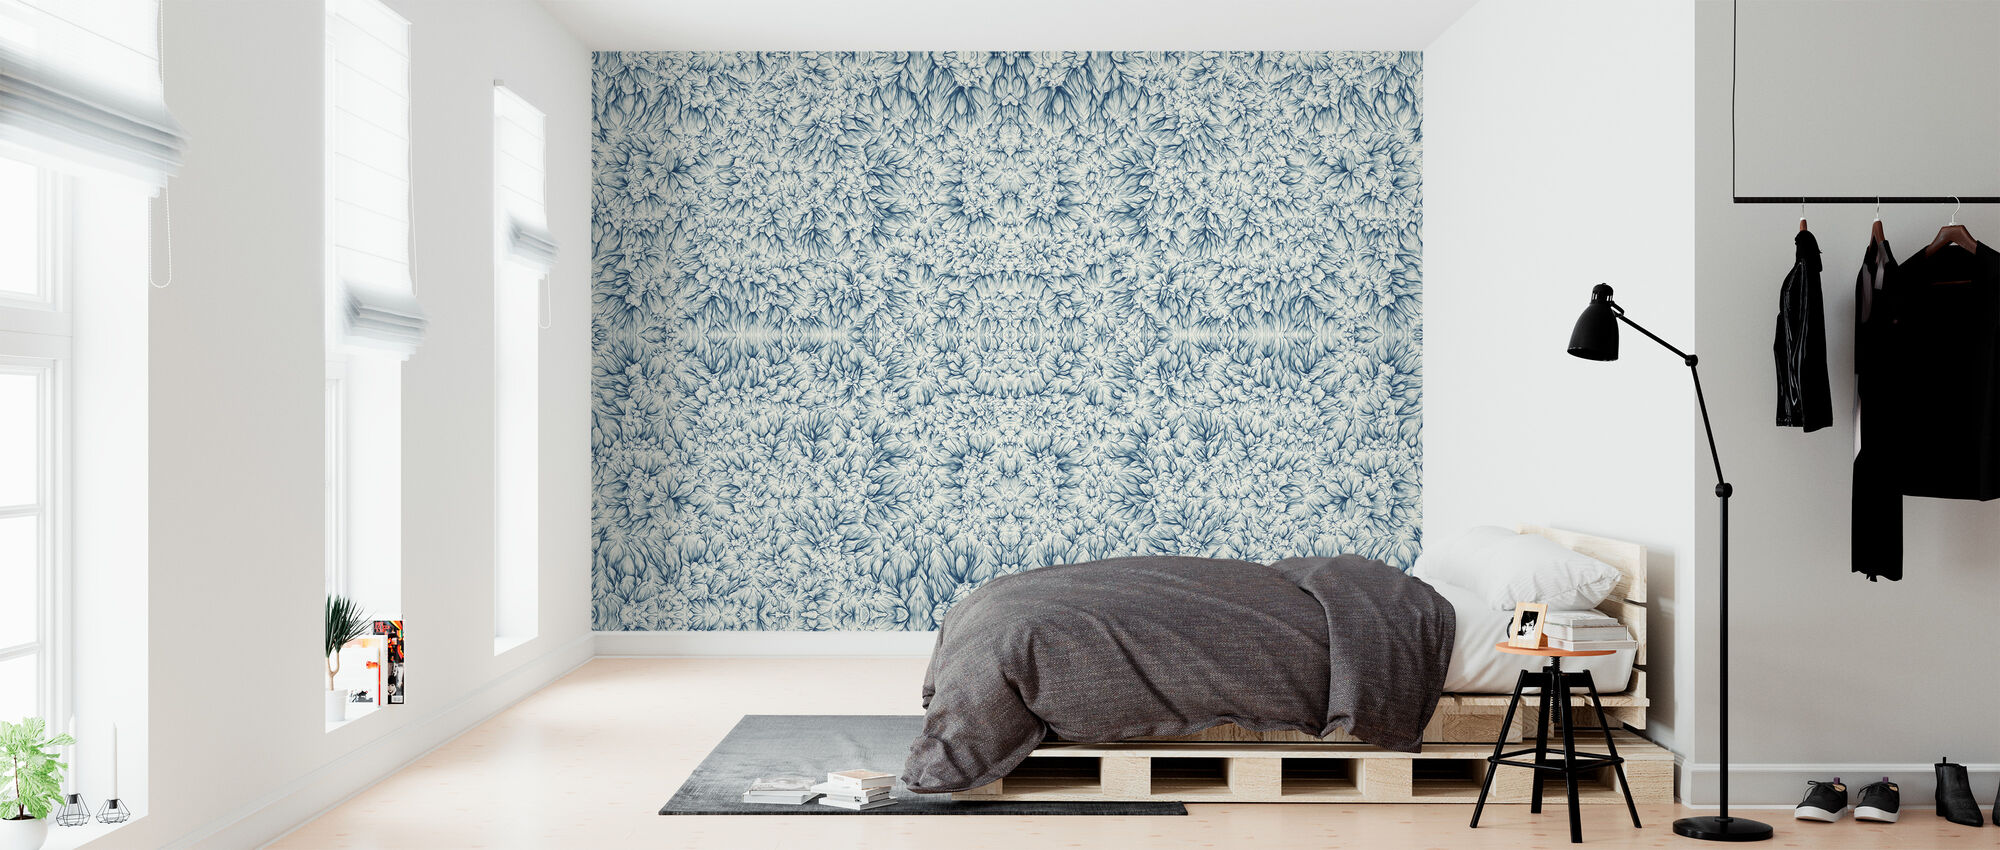 Banas Neil - Rain - Wallpaper - Bedroom